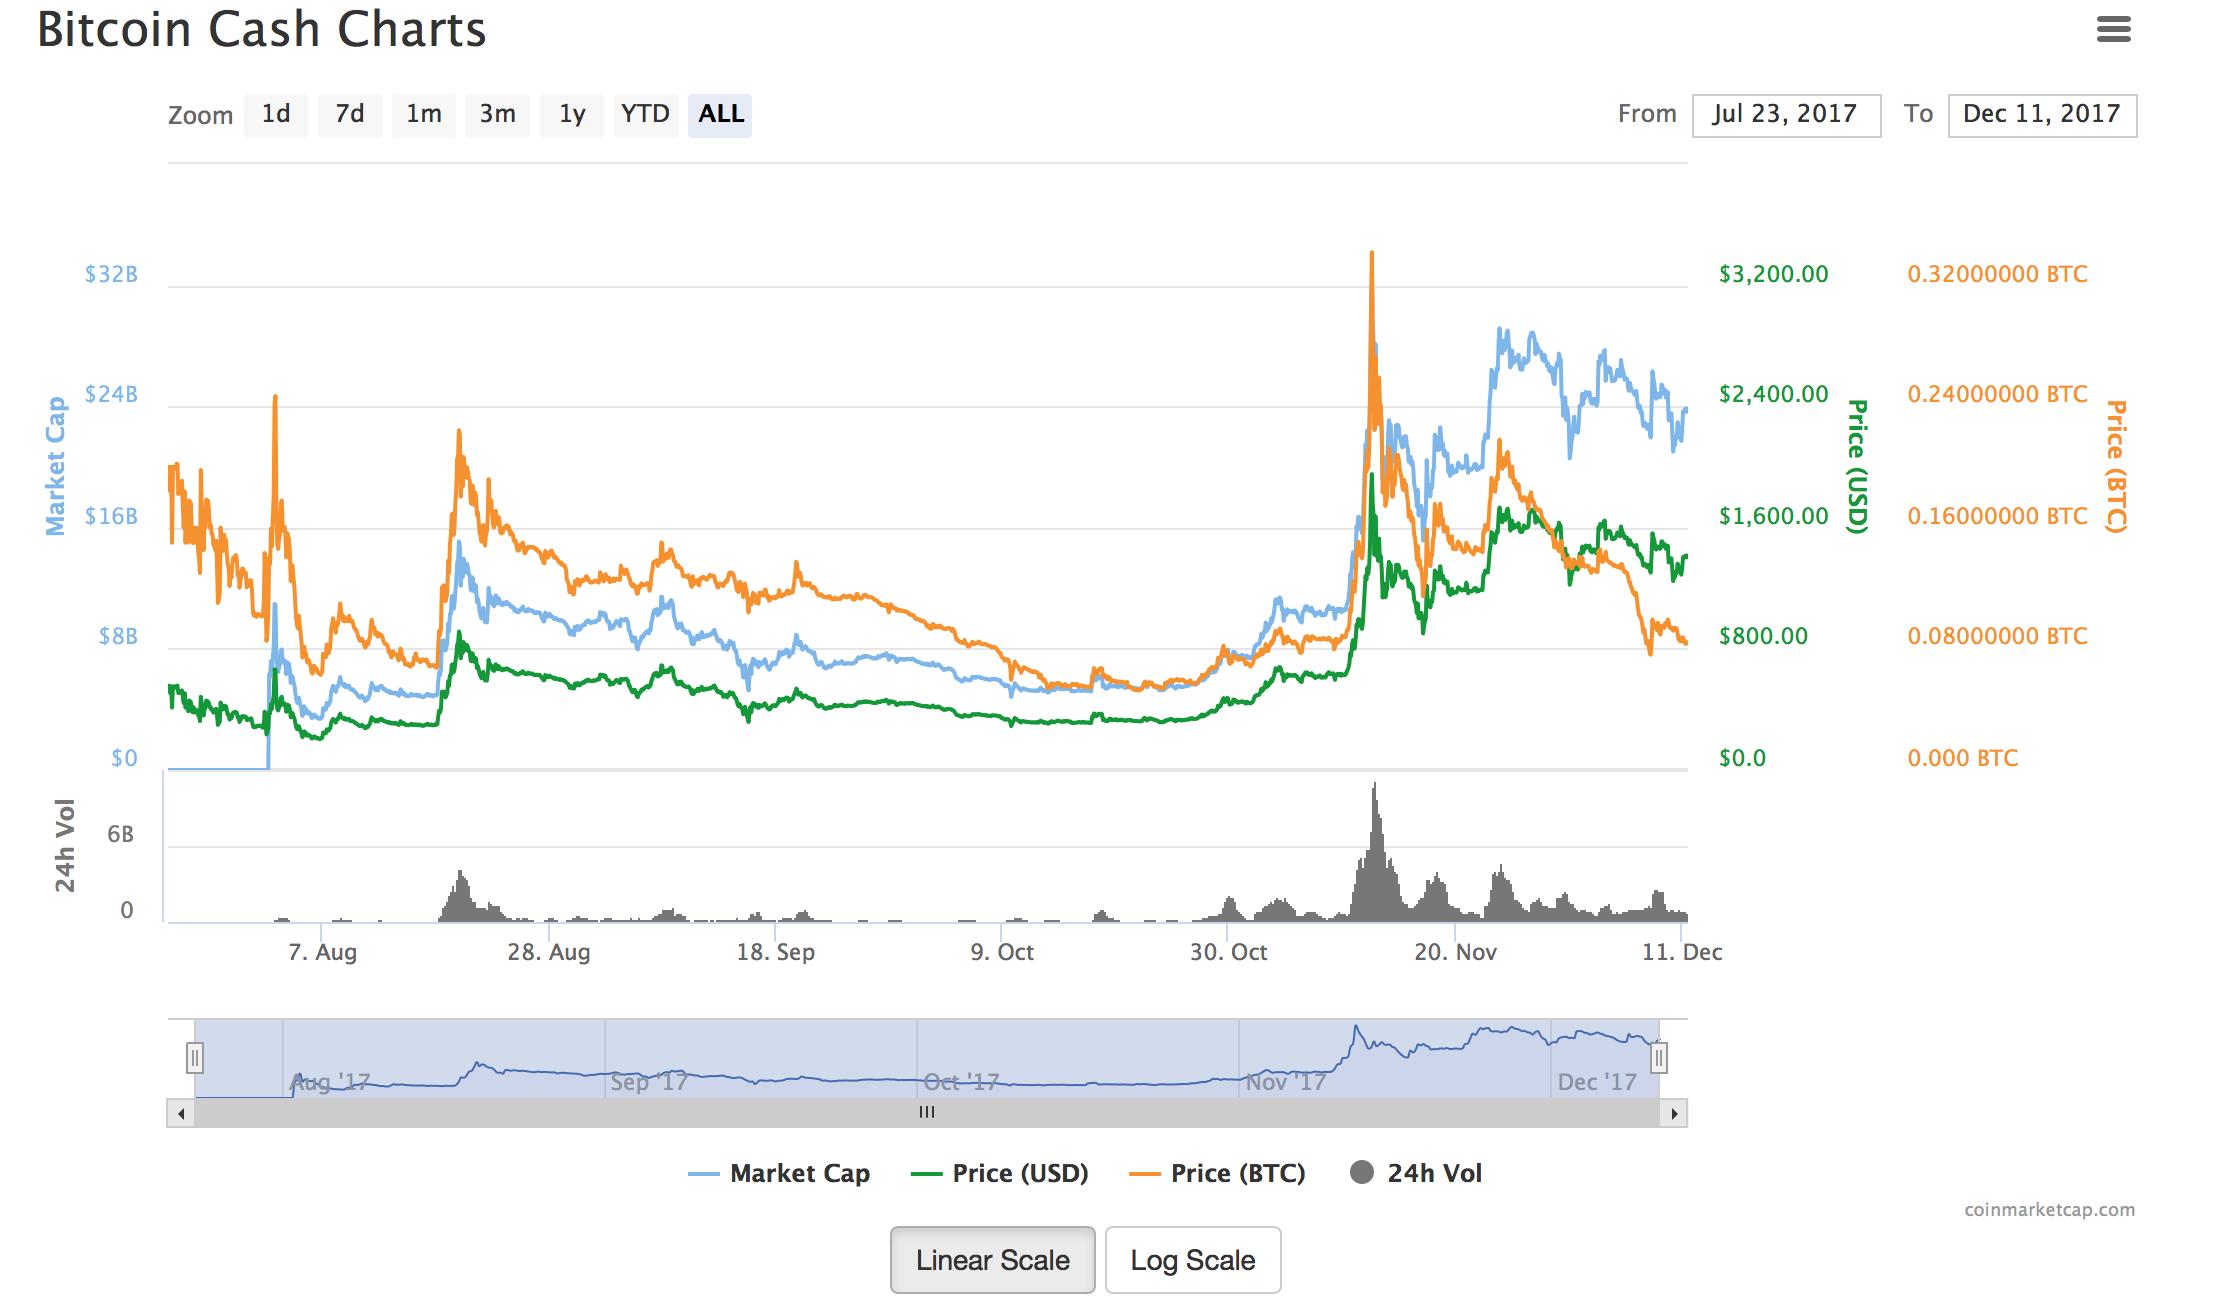 Bitcoin Cash price graph